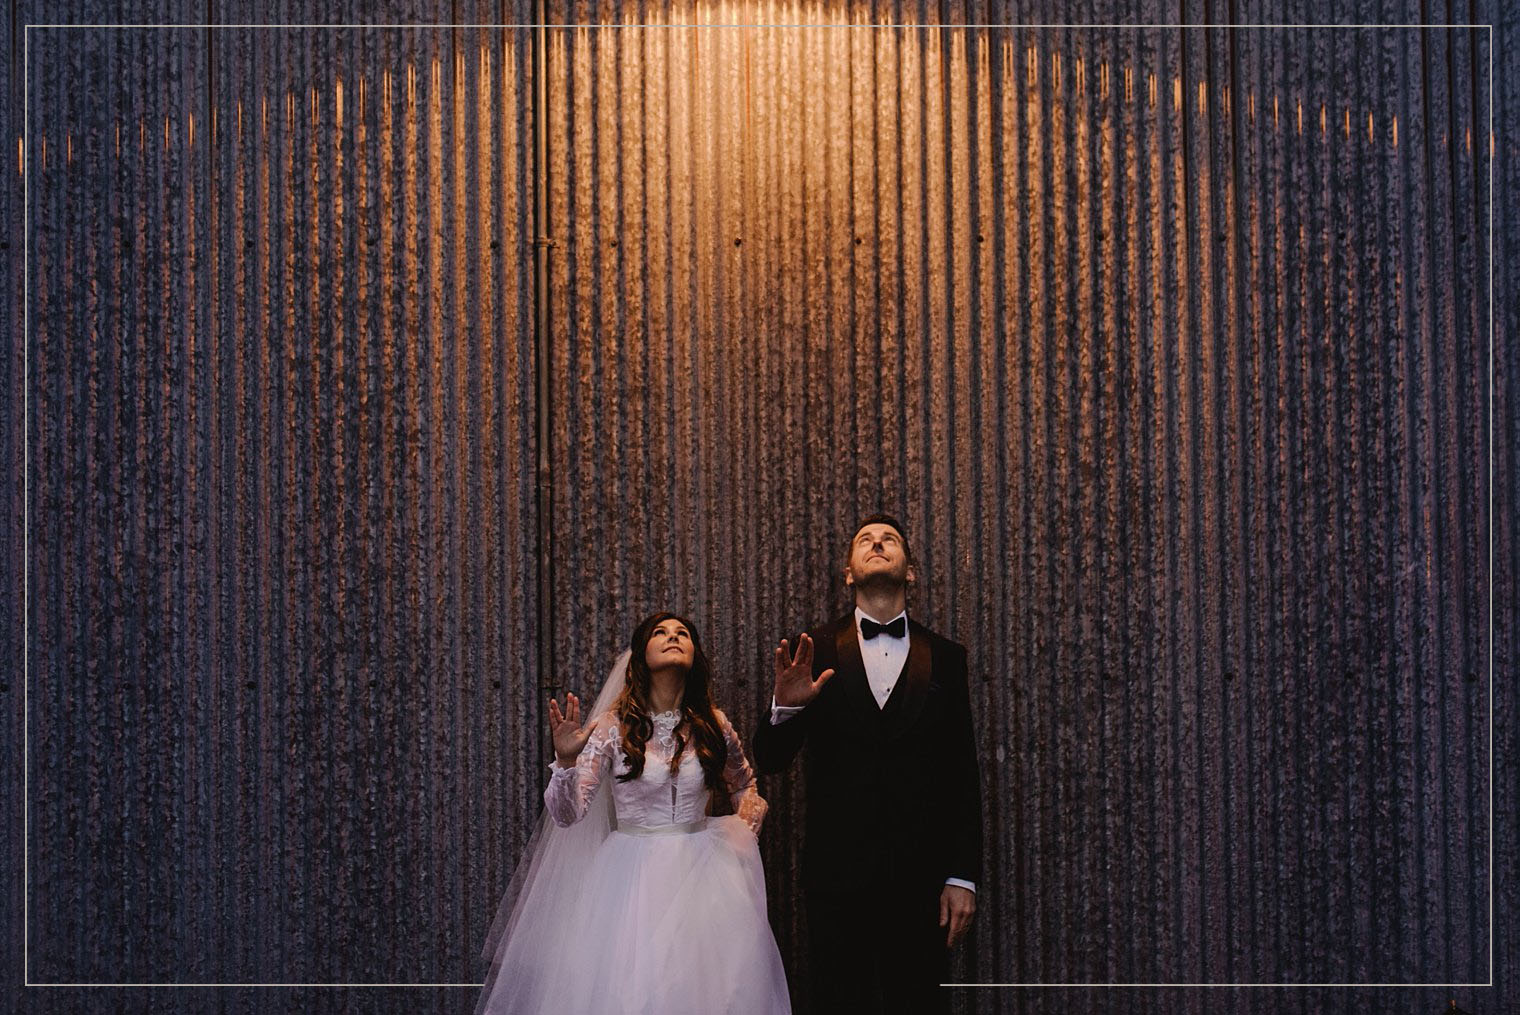 star trek inspired wedding photo by vancouver wedding photographer mathias fast